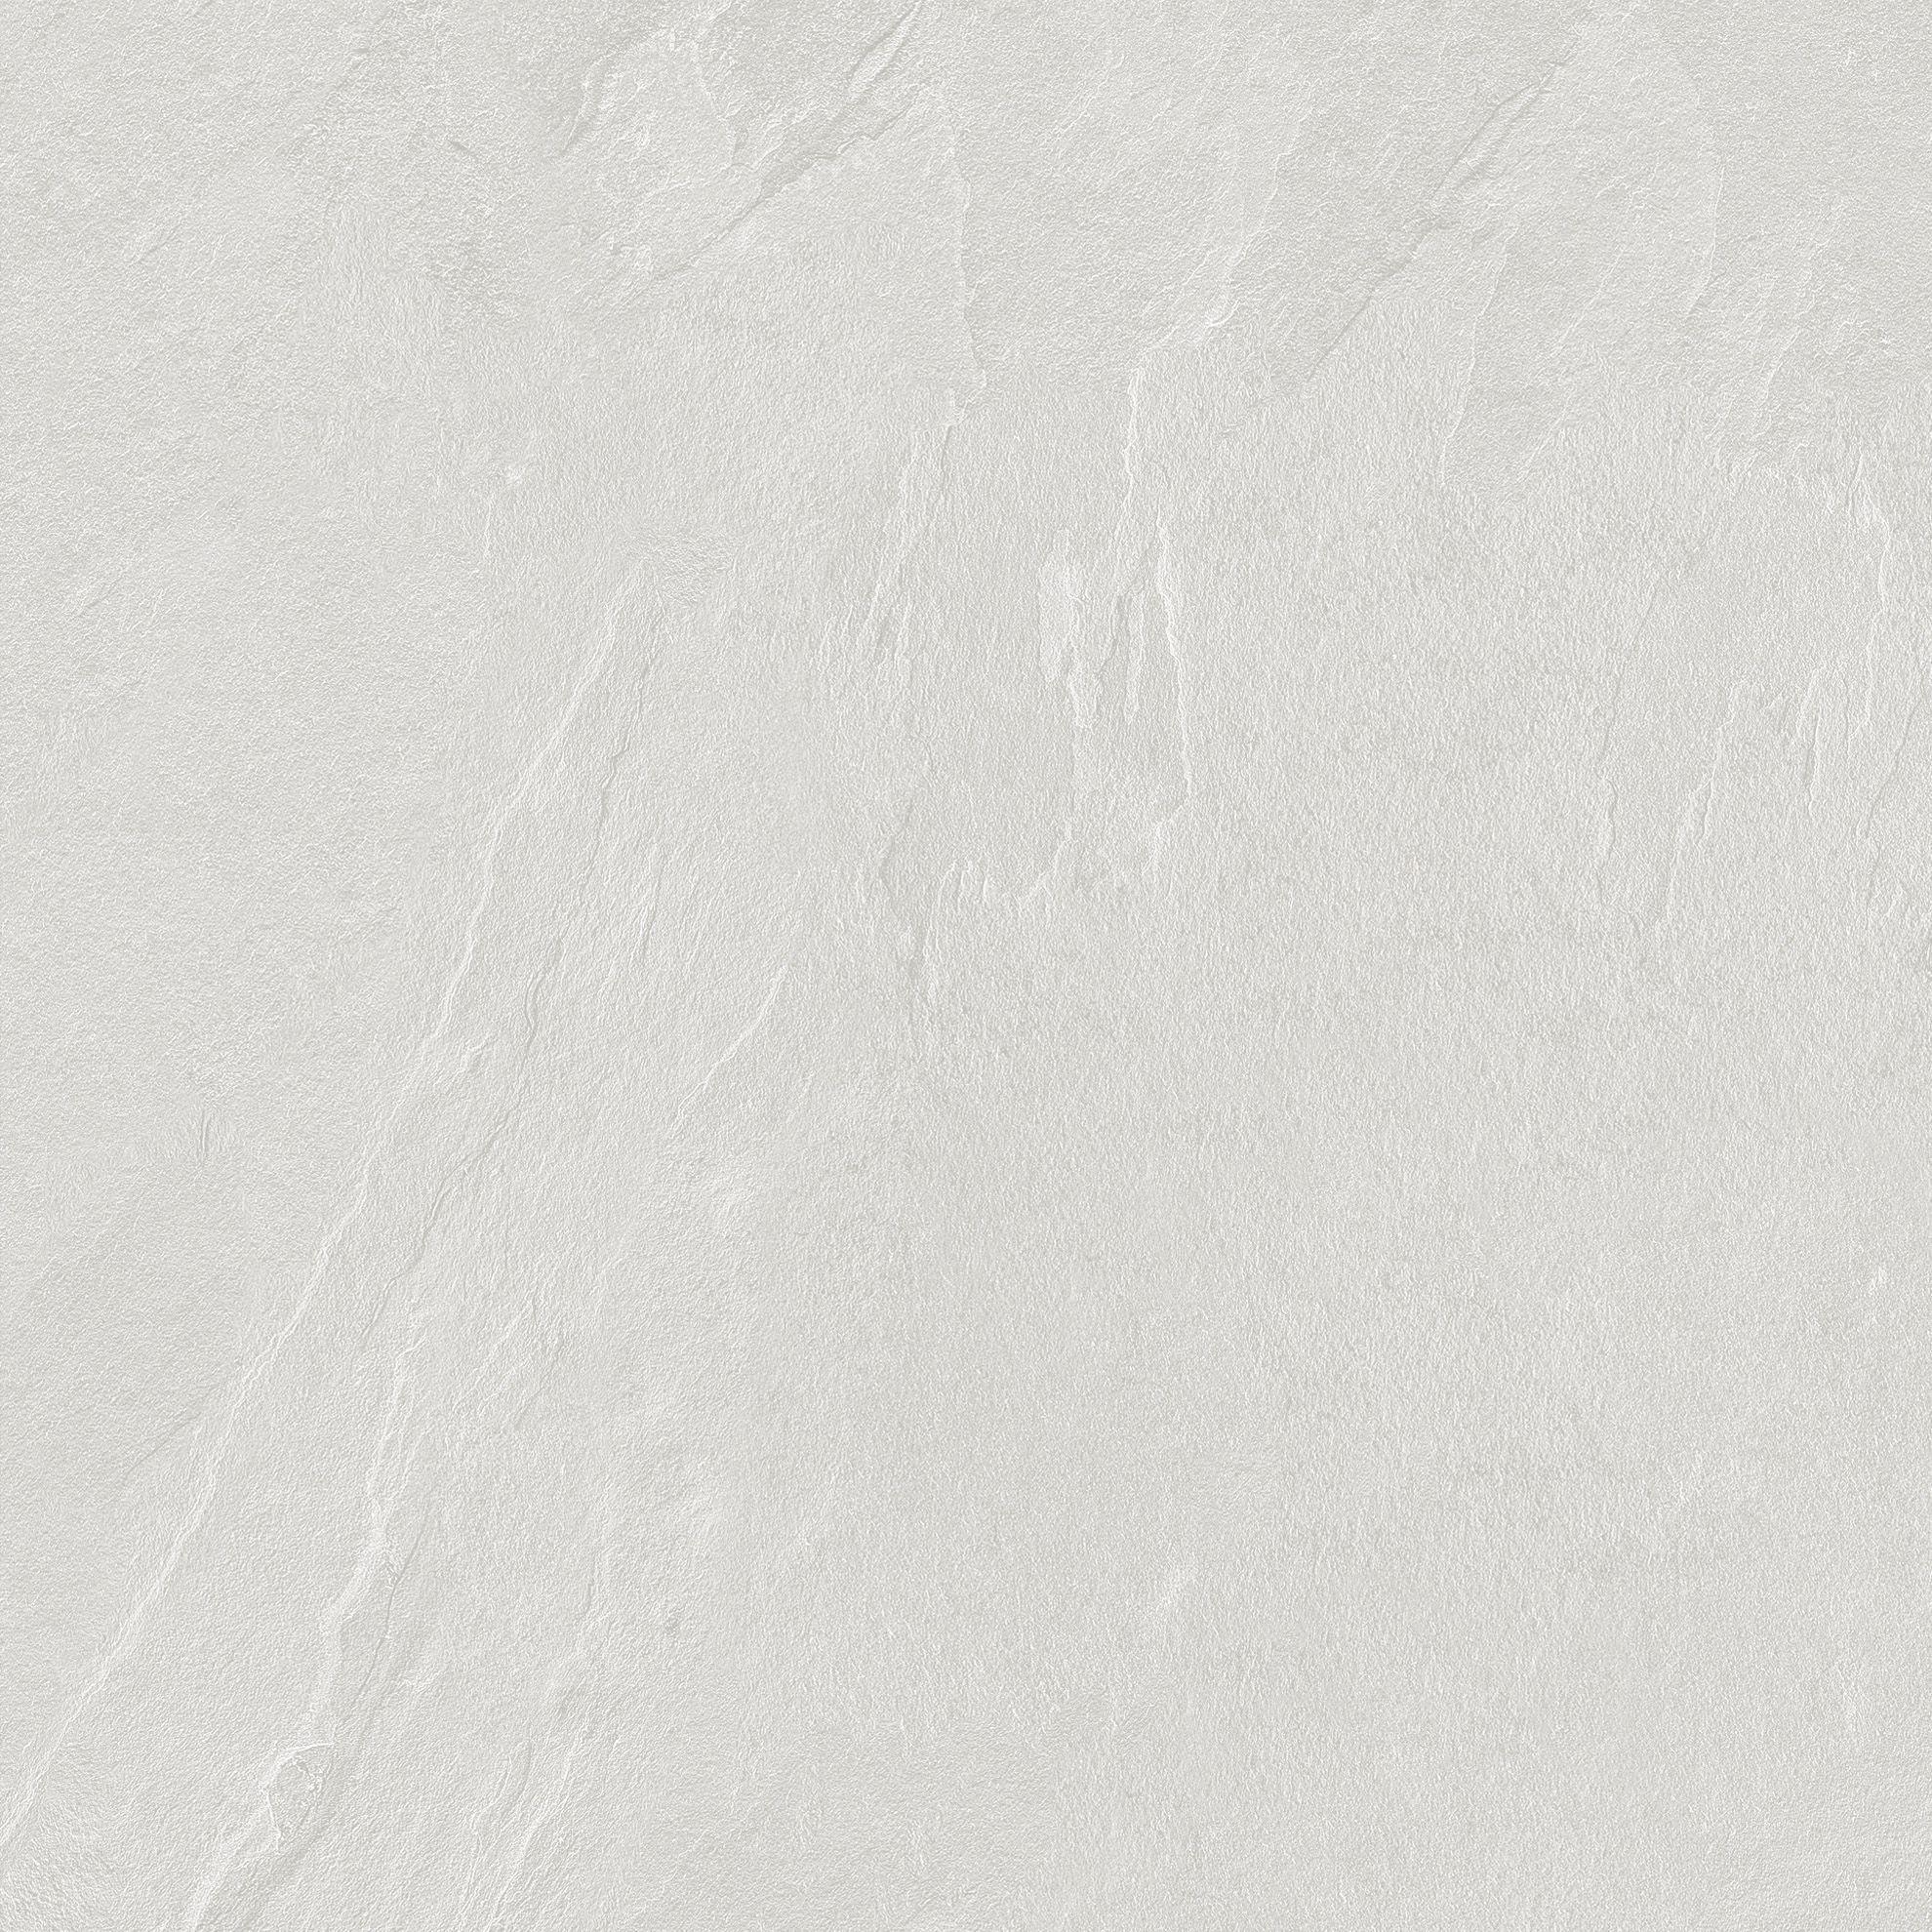 Bq Kitchen Laminate Flooring Colours Harmonia Cream Himalayan Slate Effect Laminate Flooring